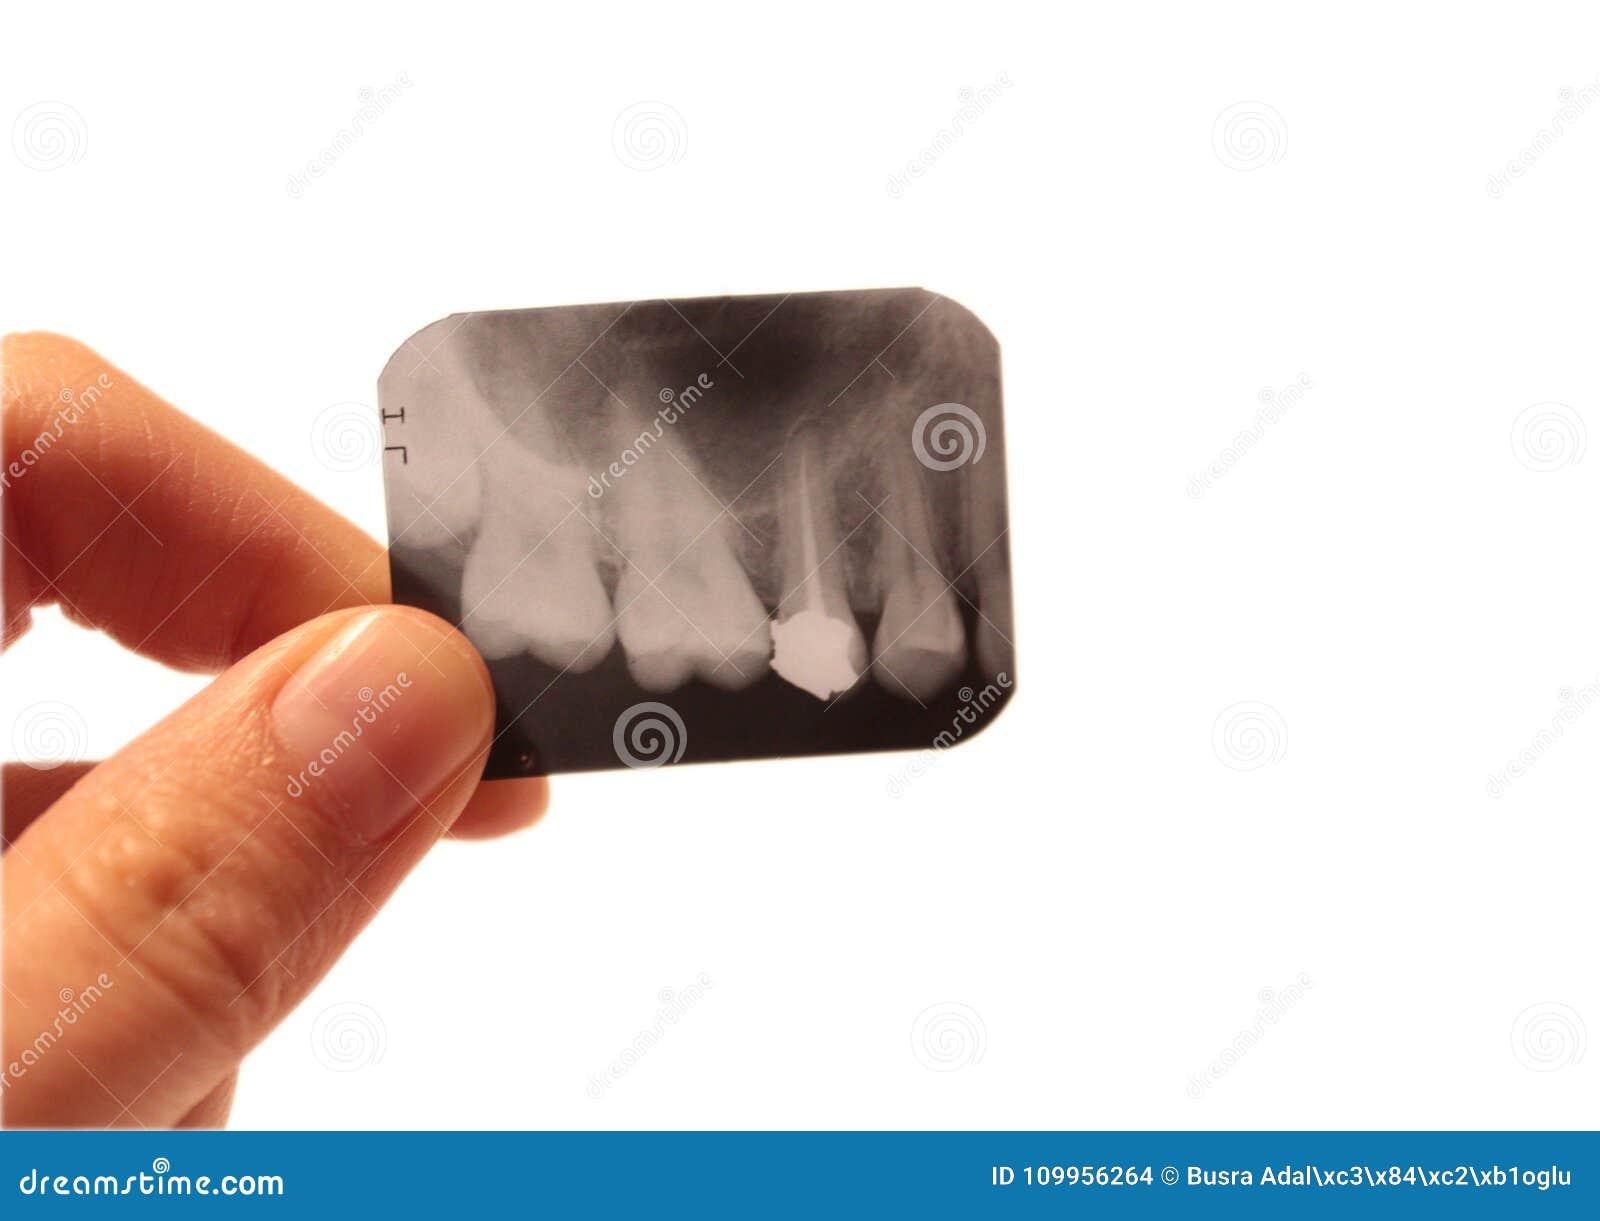 Tooth Dental Dentist Radiograpy Anatomy Stock Photo Image Of Exam